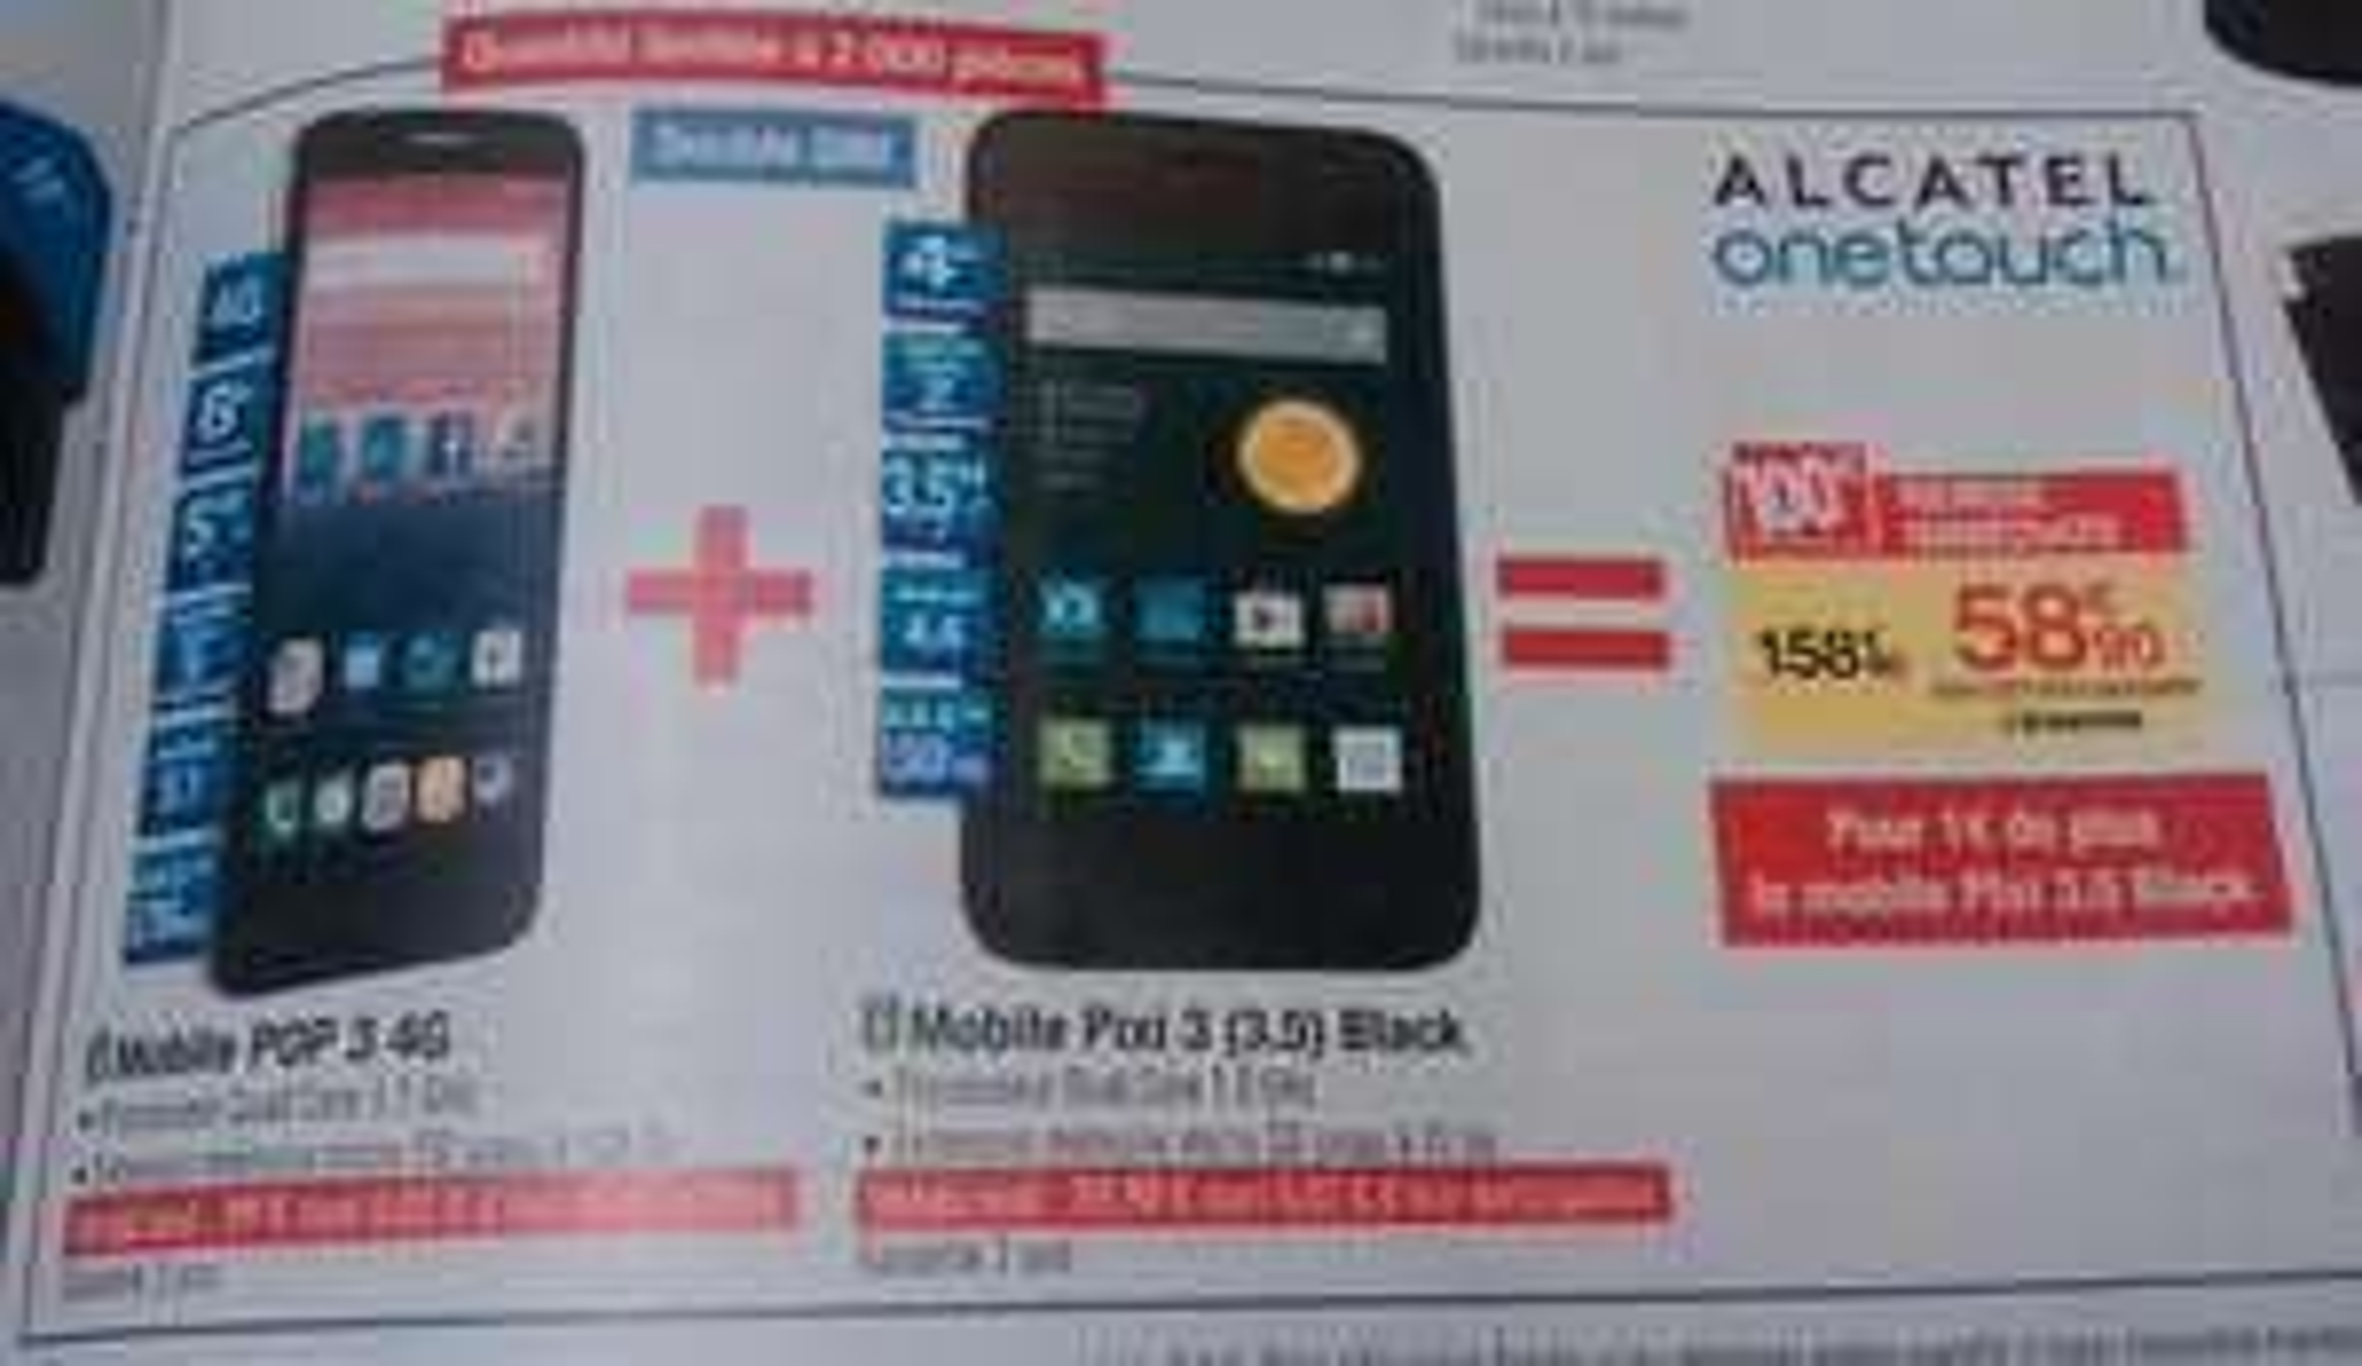 "Smartphone 5"" Alcatel Onetouch Pop 3 4G + Smartphone Alcatel 3,5"" Pixi 3"